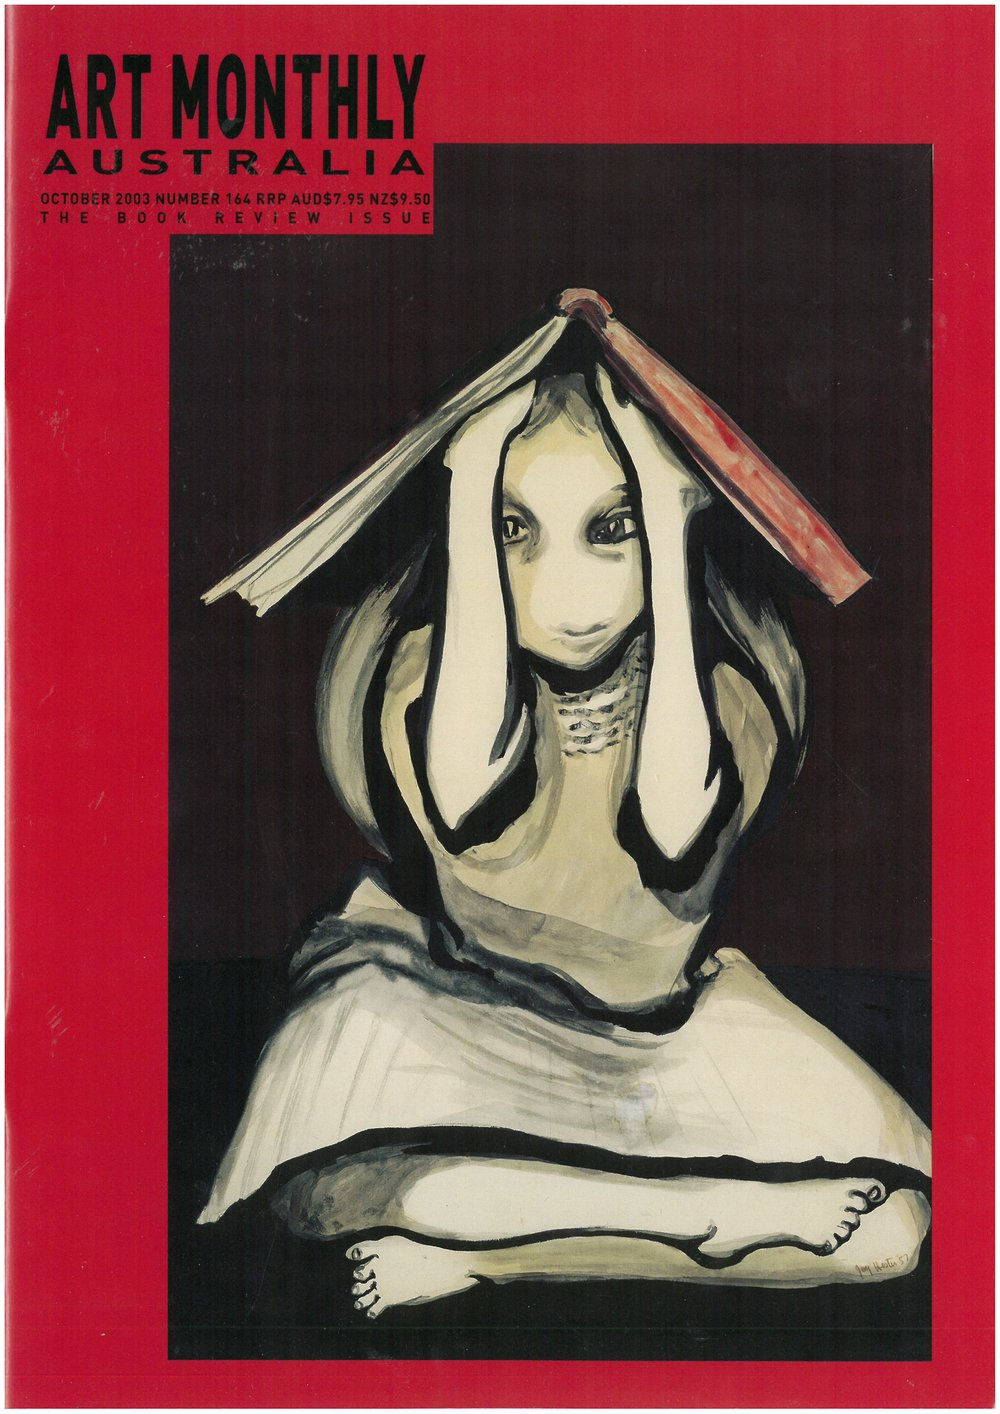 Issue 164 October 2003